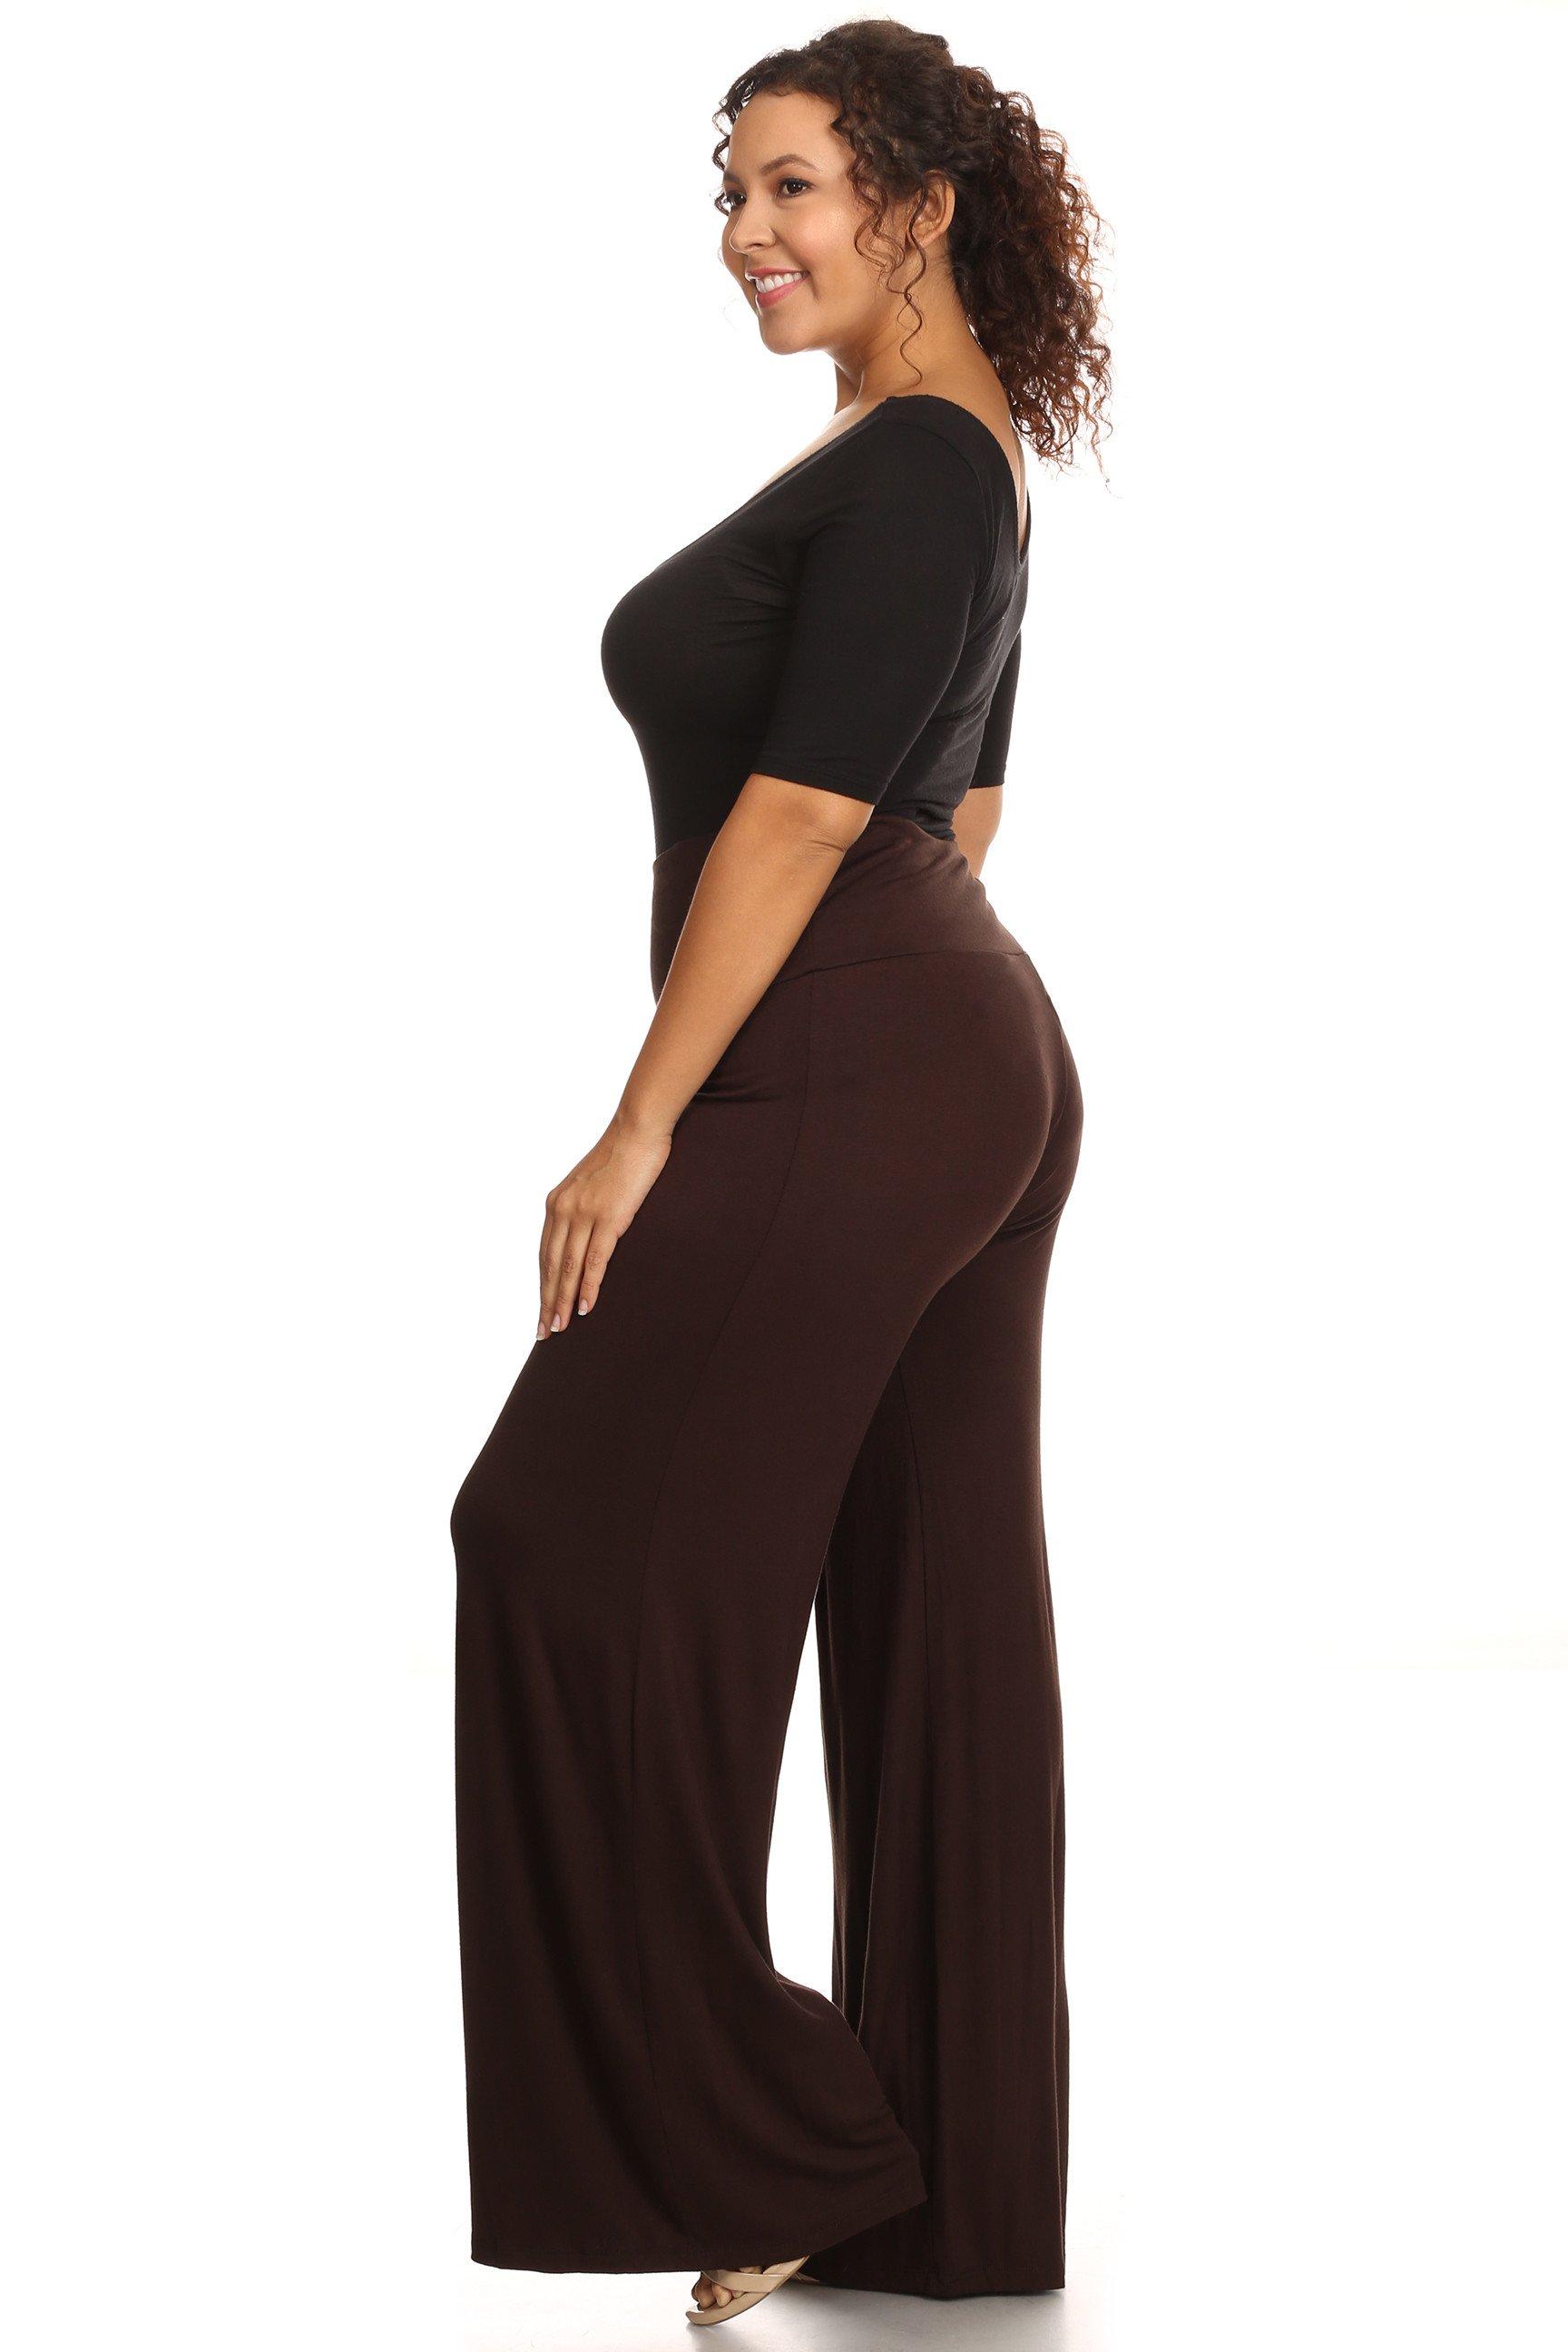 plus size palazzo pants plus size womenu0027s palazzo pants hight waisted made in the usa QOLVQRZ